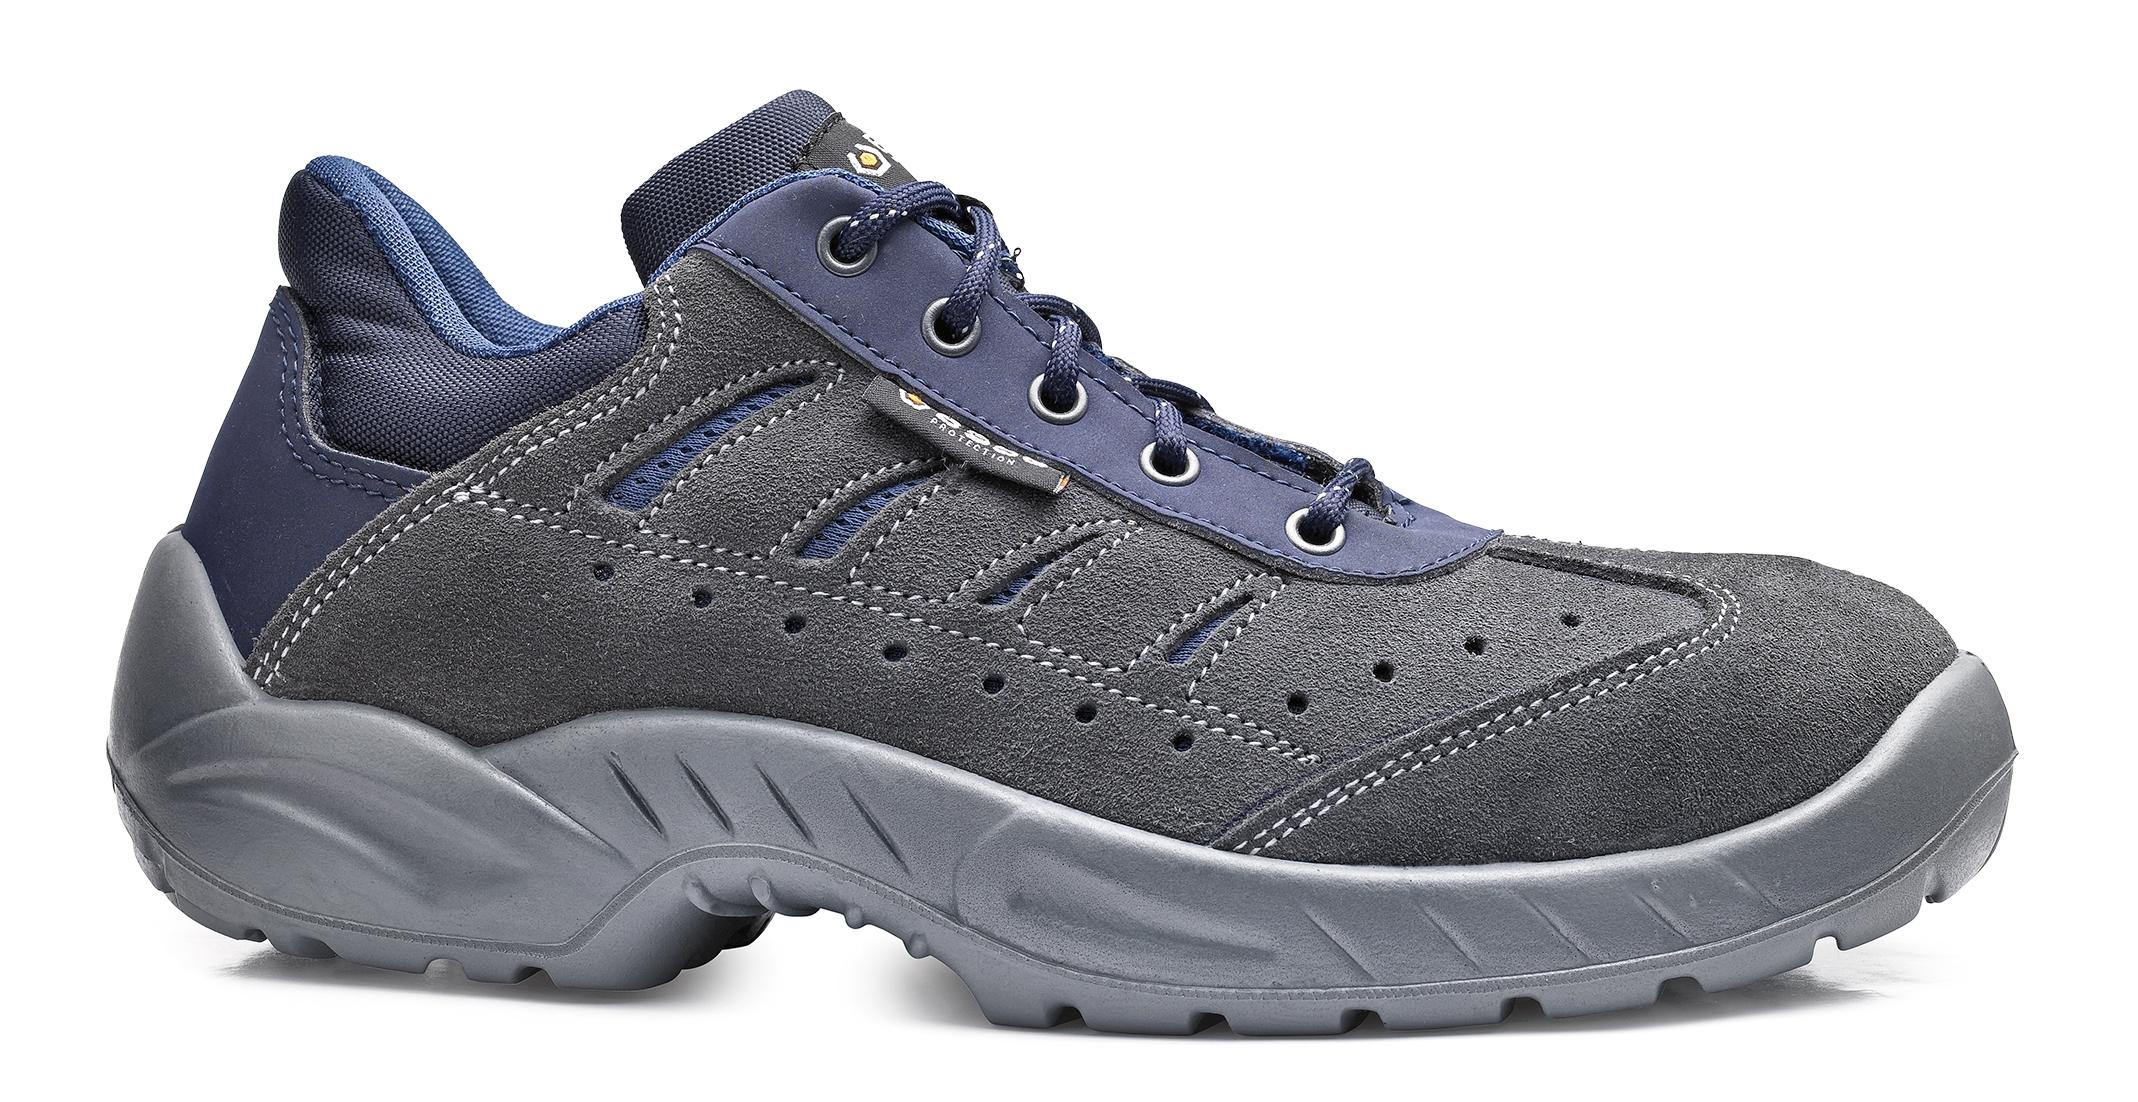 Base-BO163-Colosseum-S1P-SRC-Smart-Mens-Nonslip-Laced-Safety-Shoe